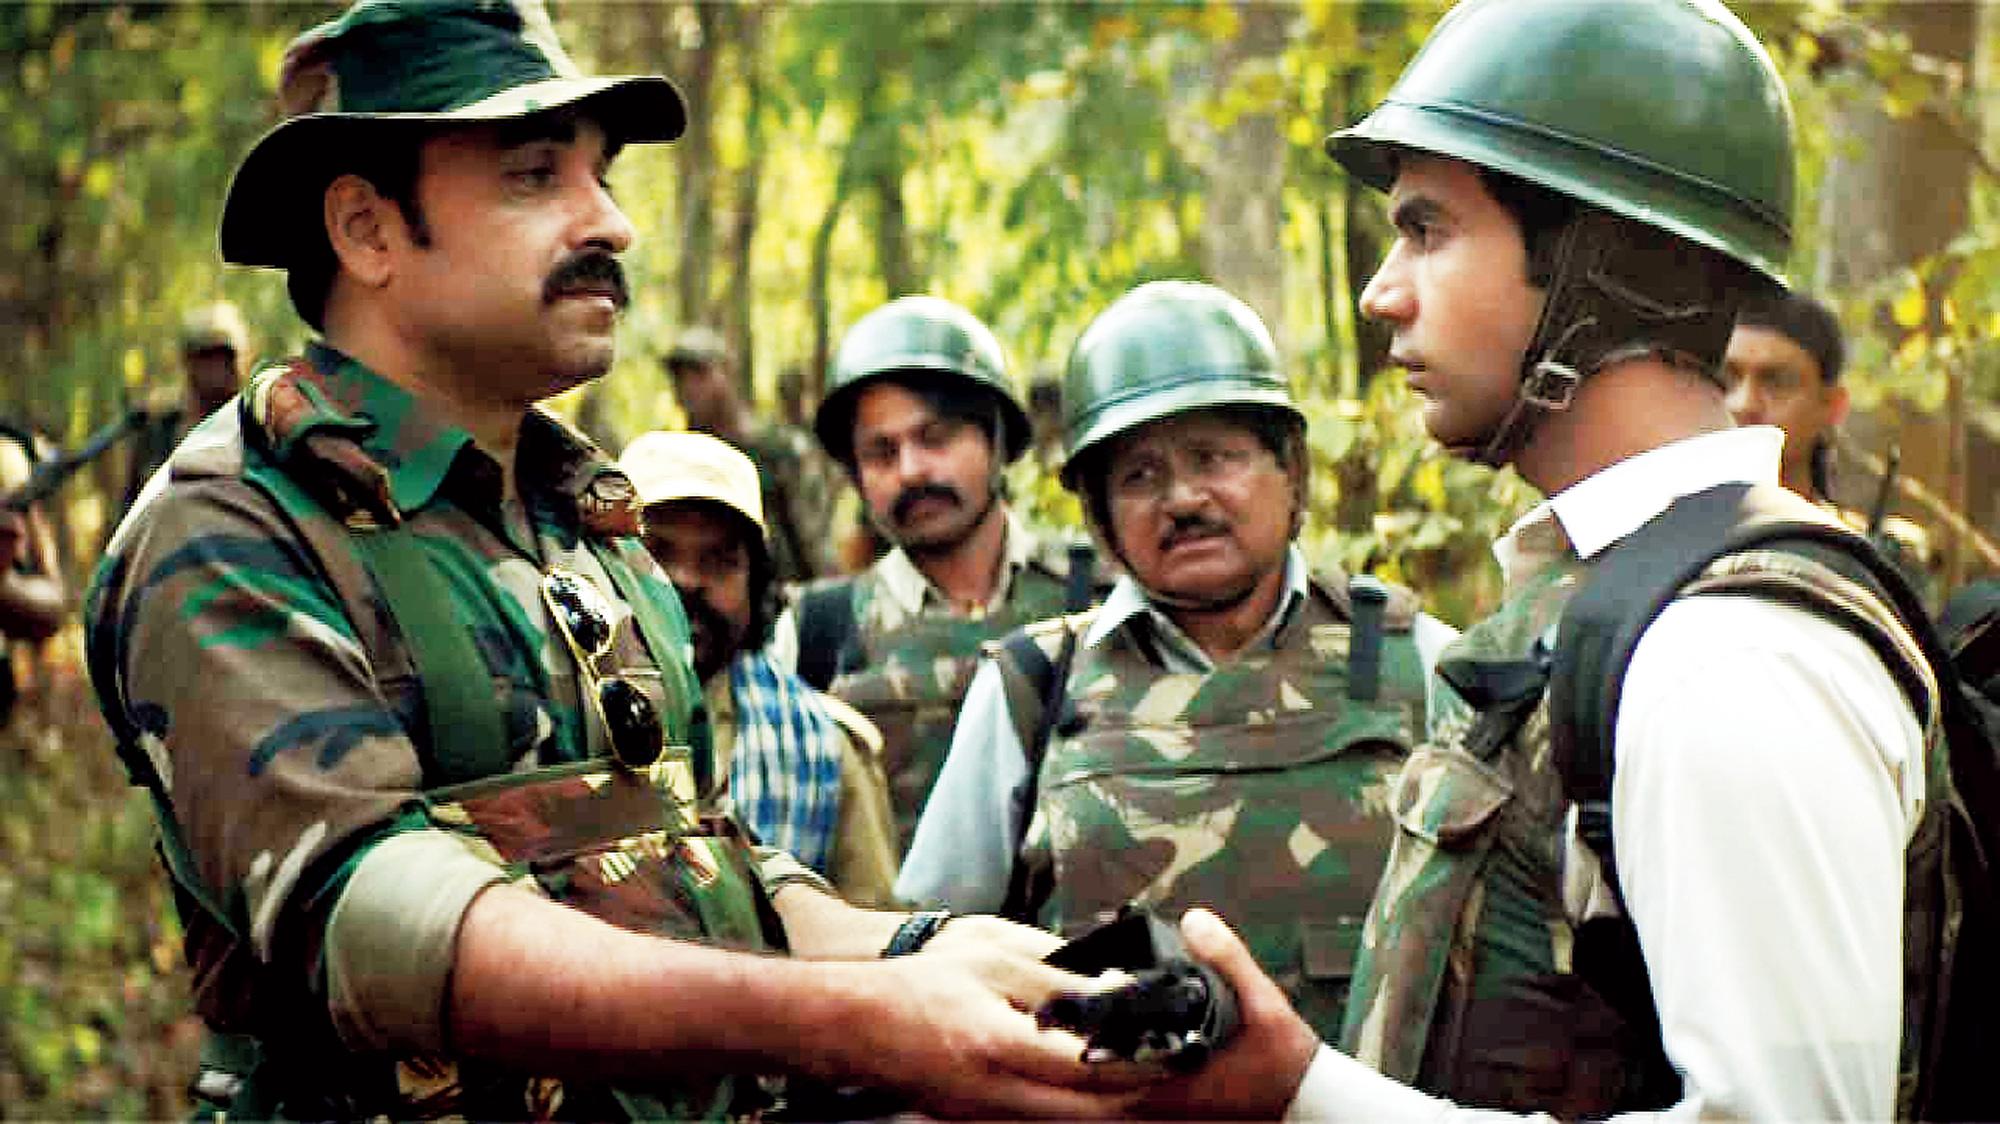 Pankaj Tripathi as Assistant Commandant Atma Singh with Rajkummar Rao as Newton from the film Newton.